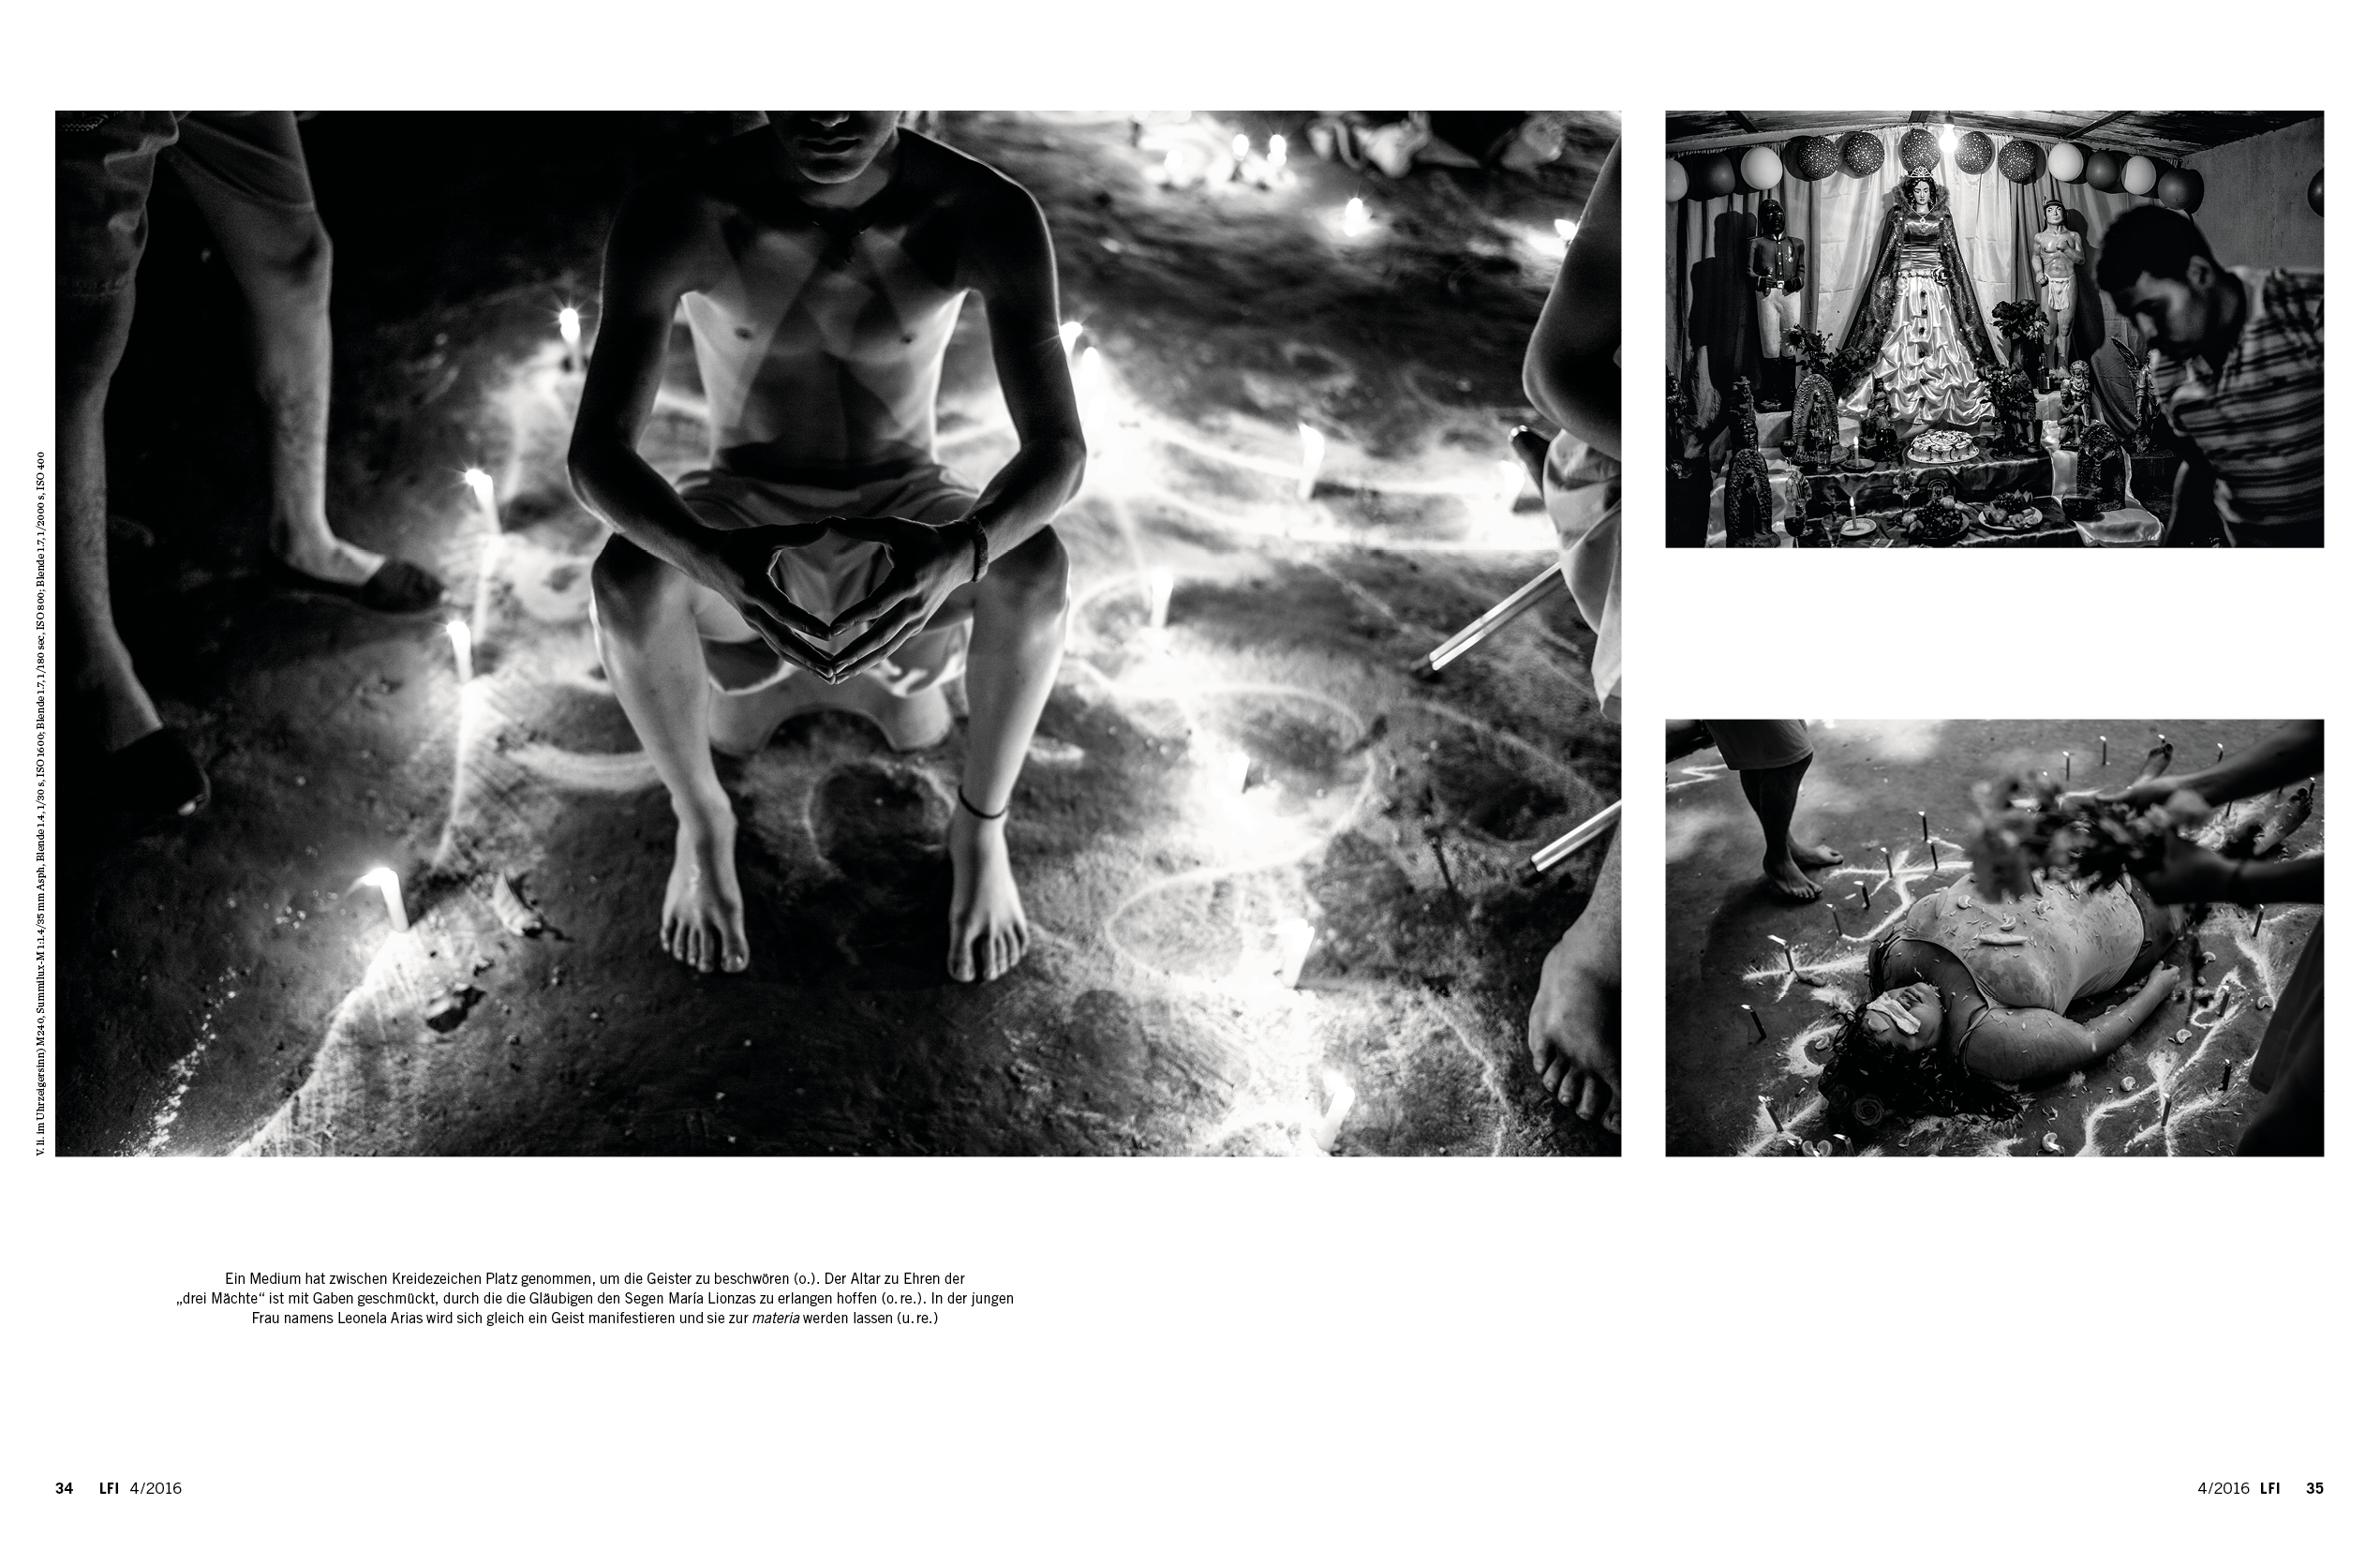 LFI U2013 Leica Fotografie International